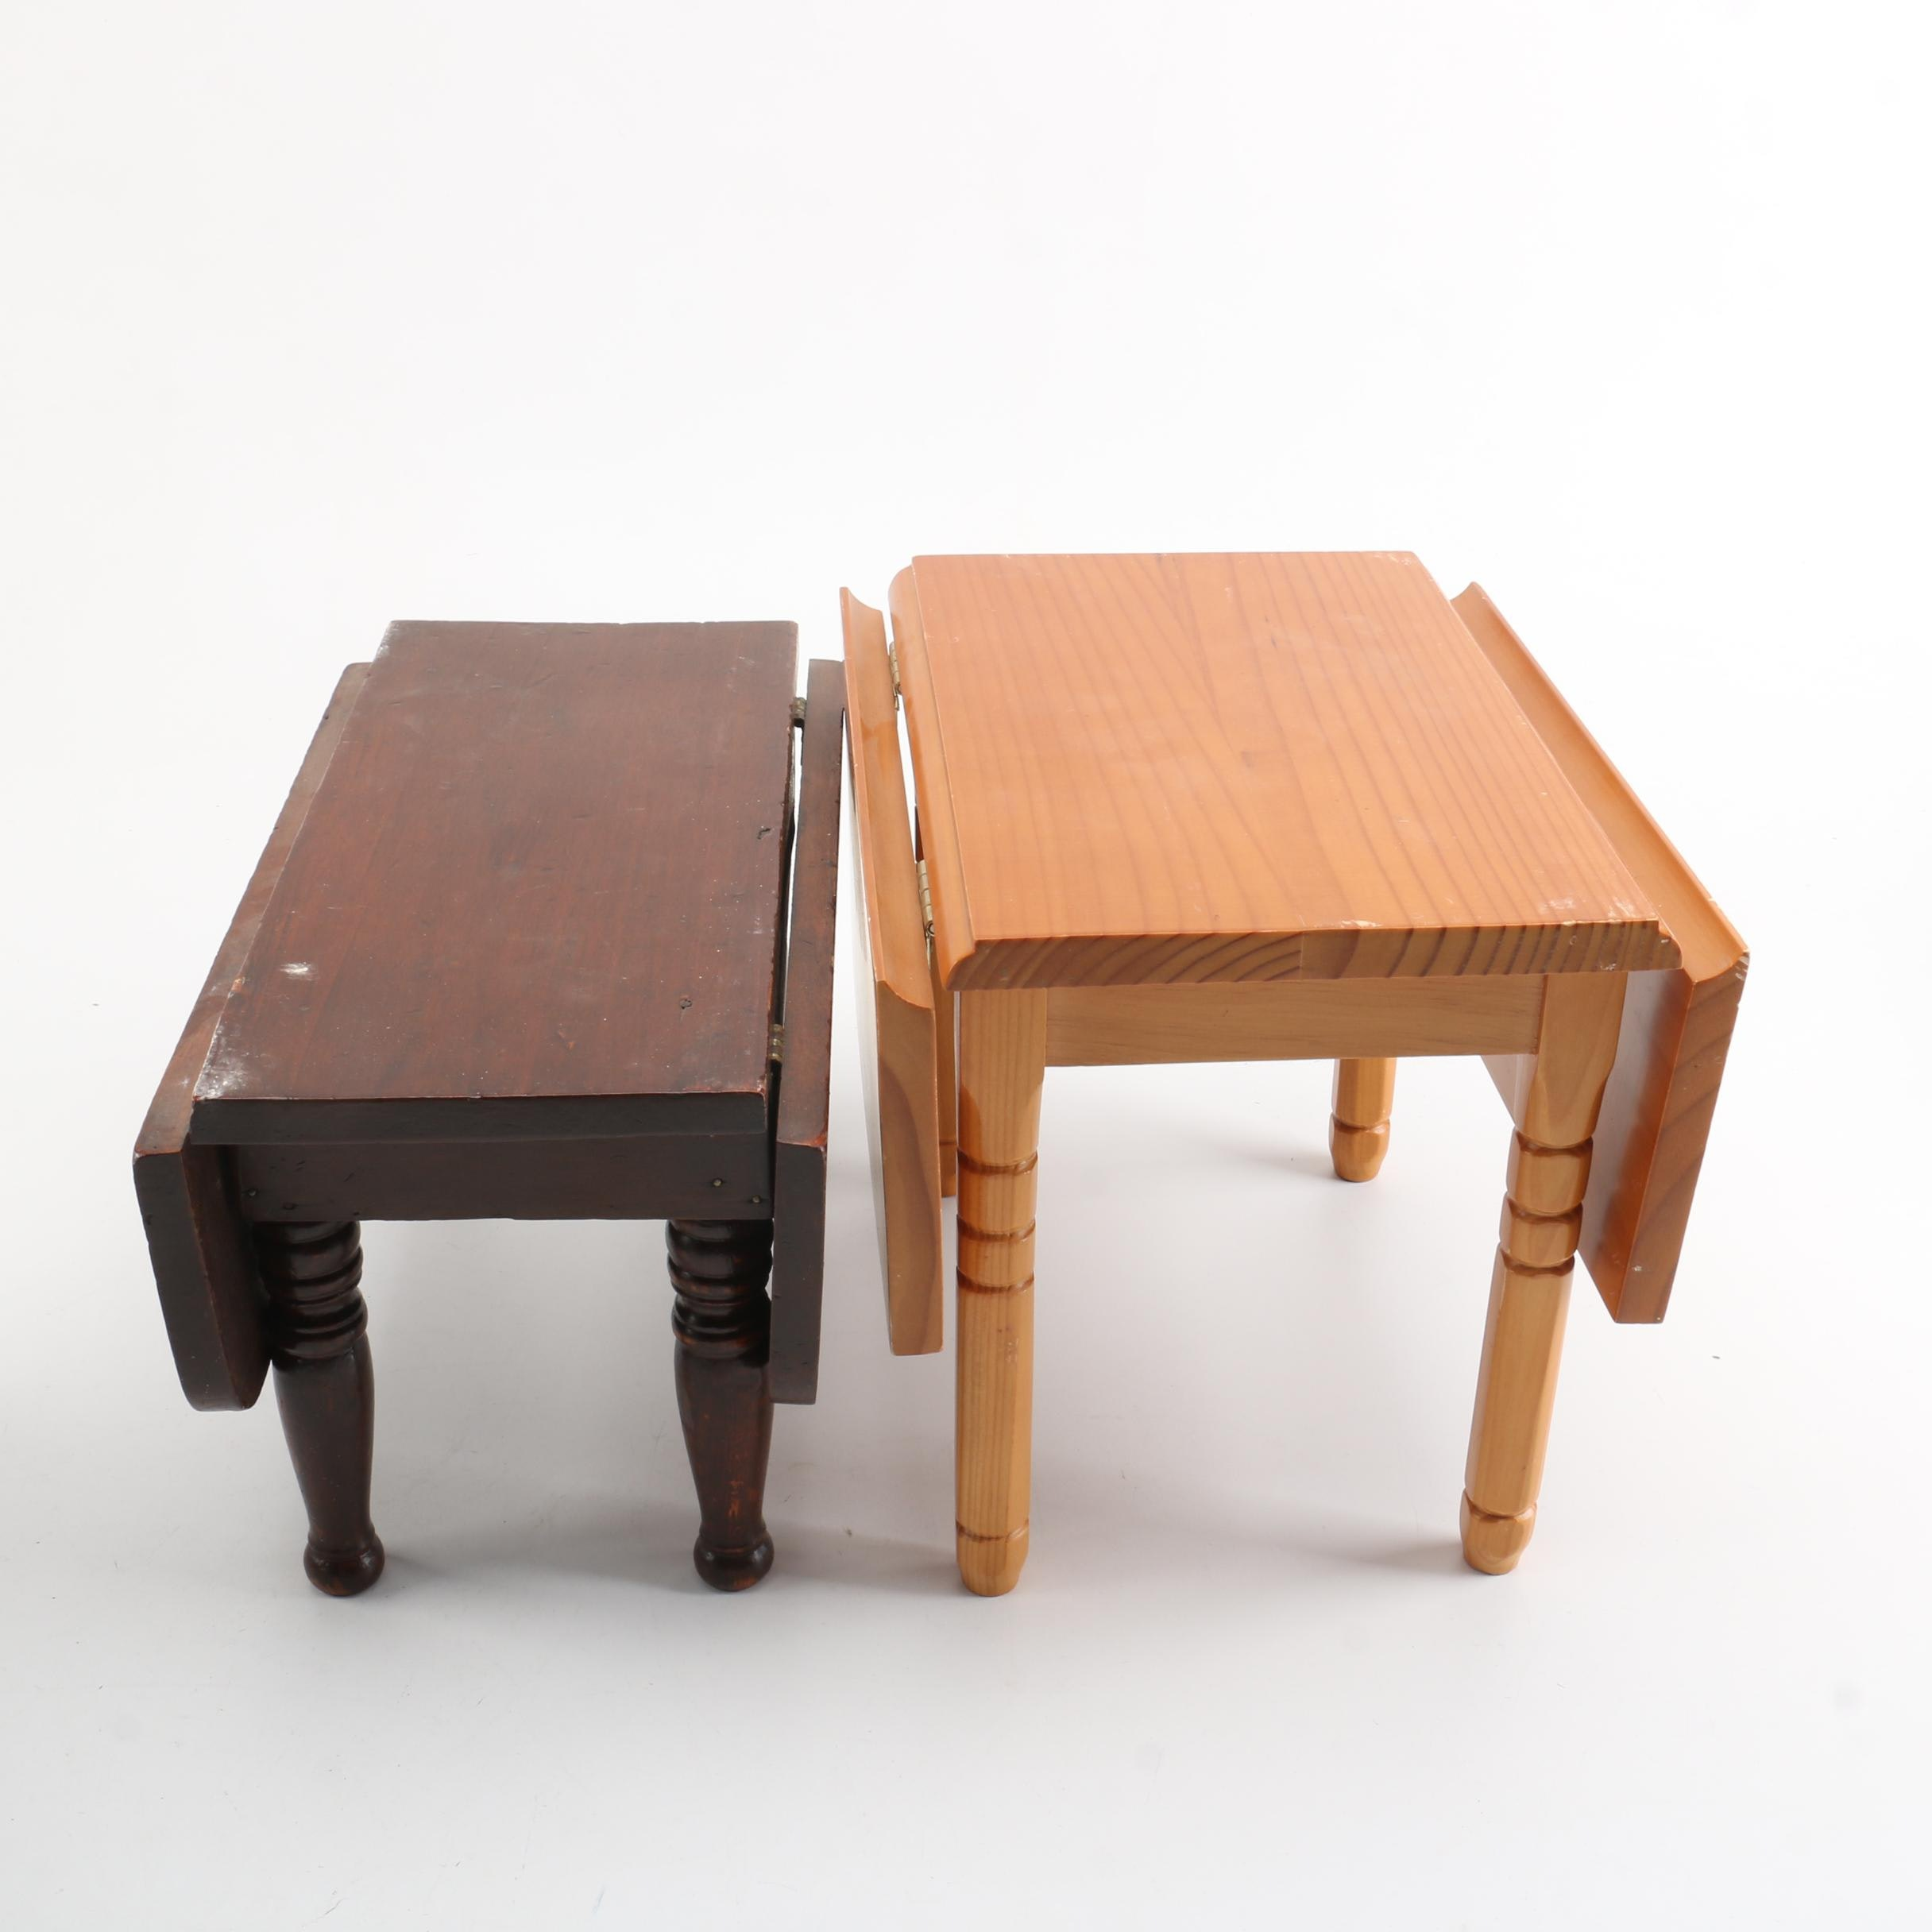 Miniature Drop Leaf Tables